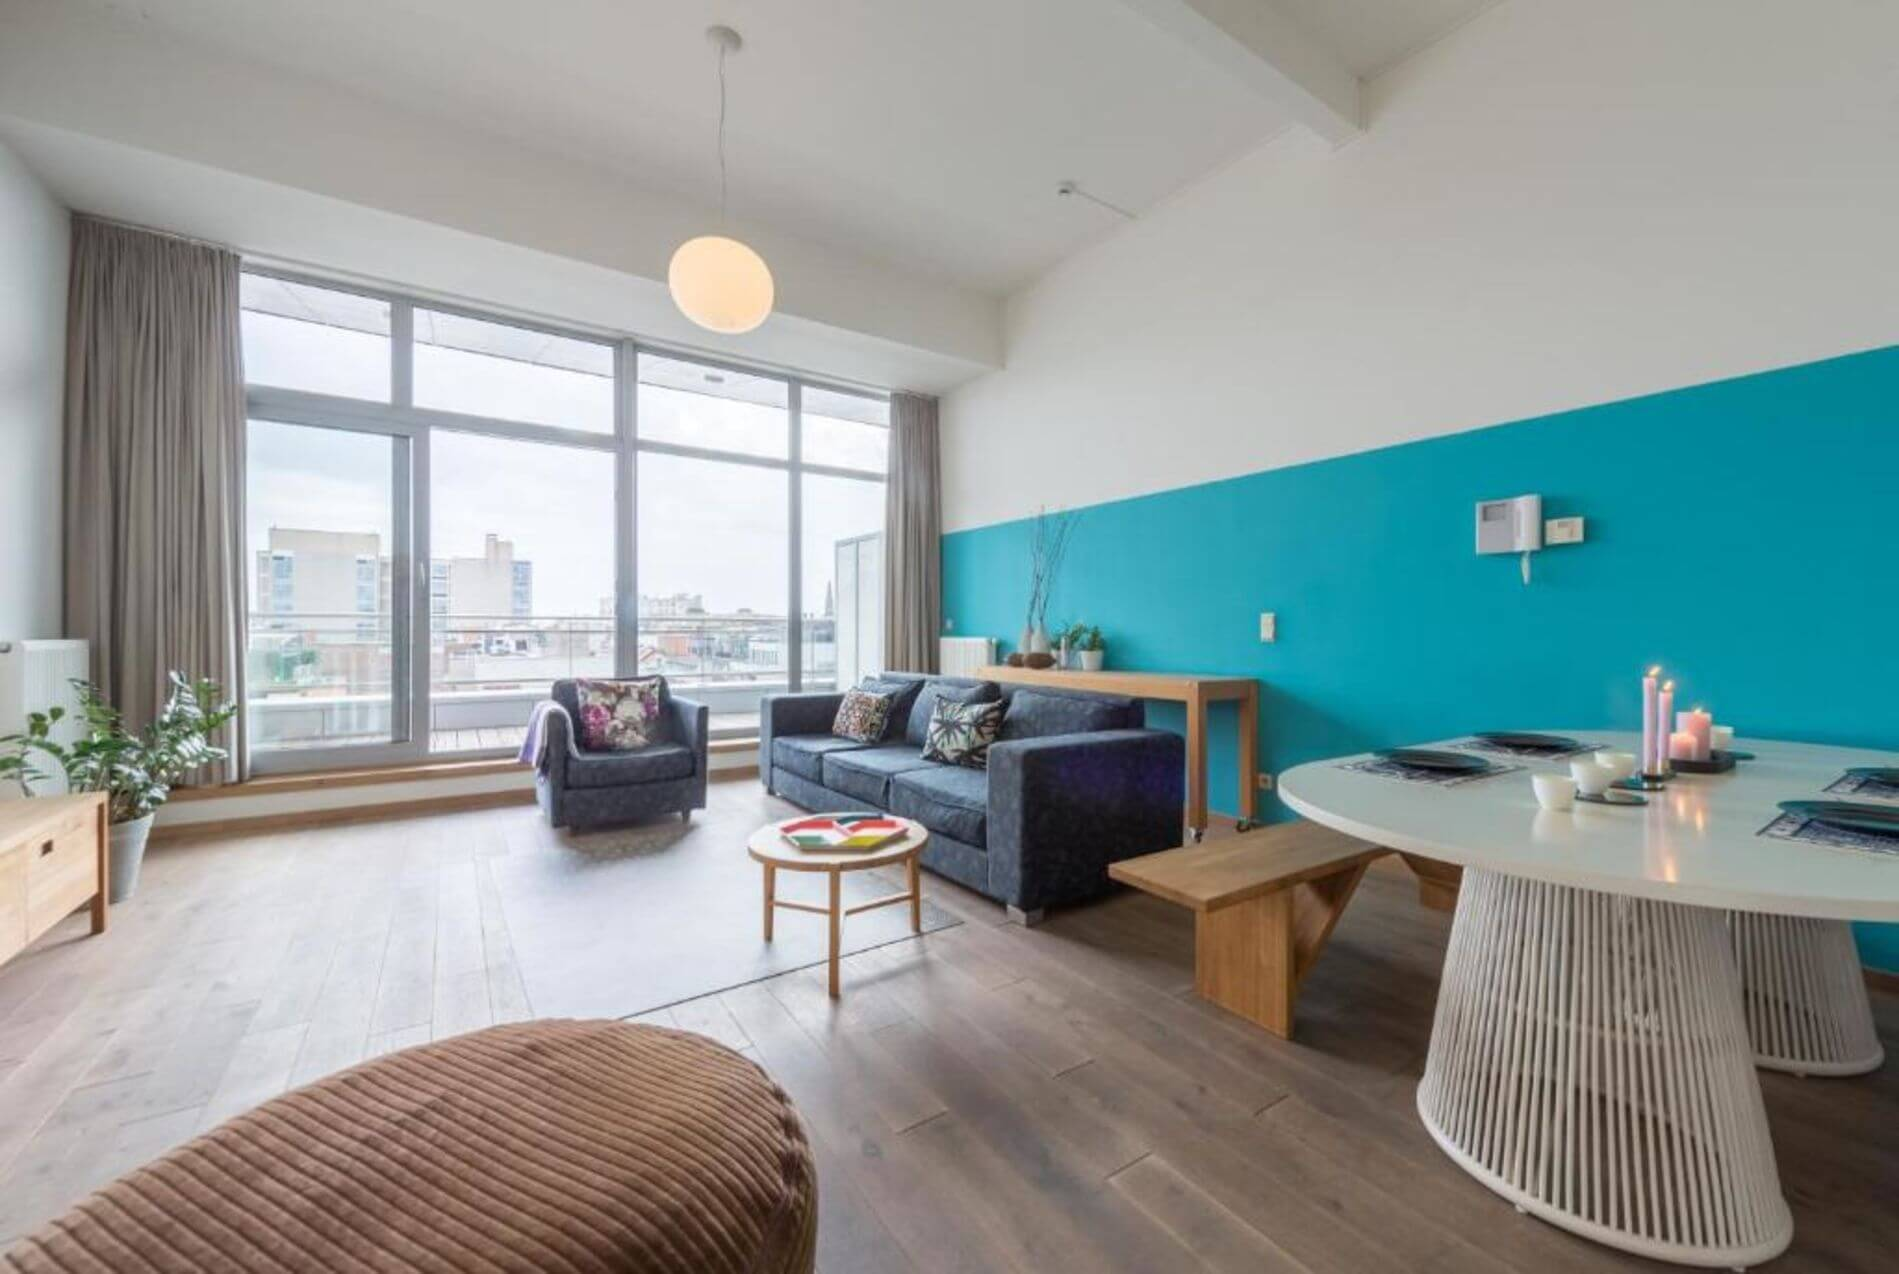 Duplex rental apartment for 4 in Antwerp